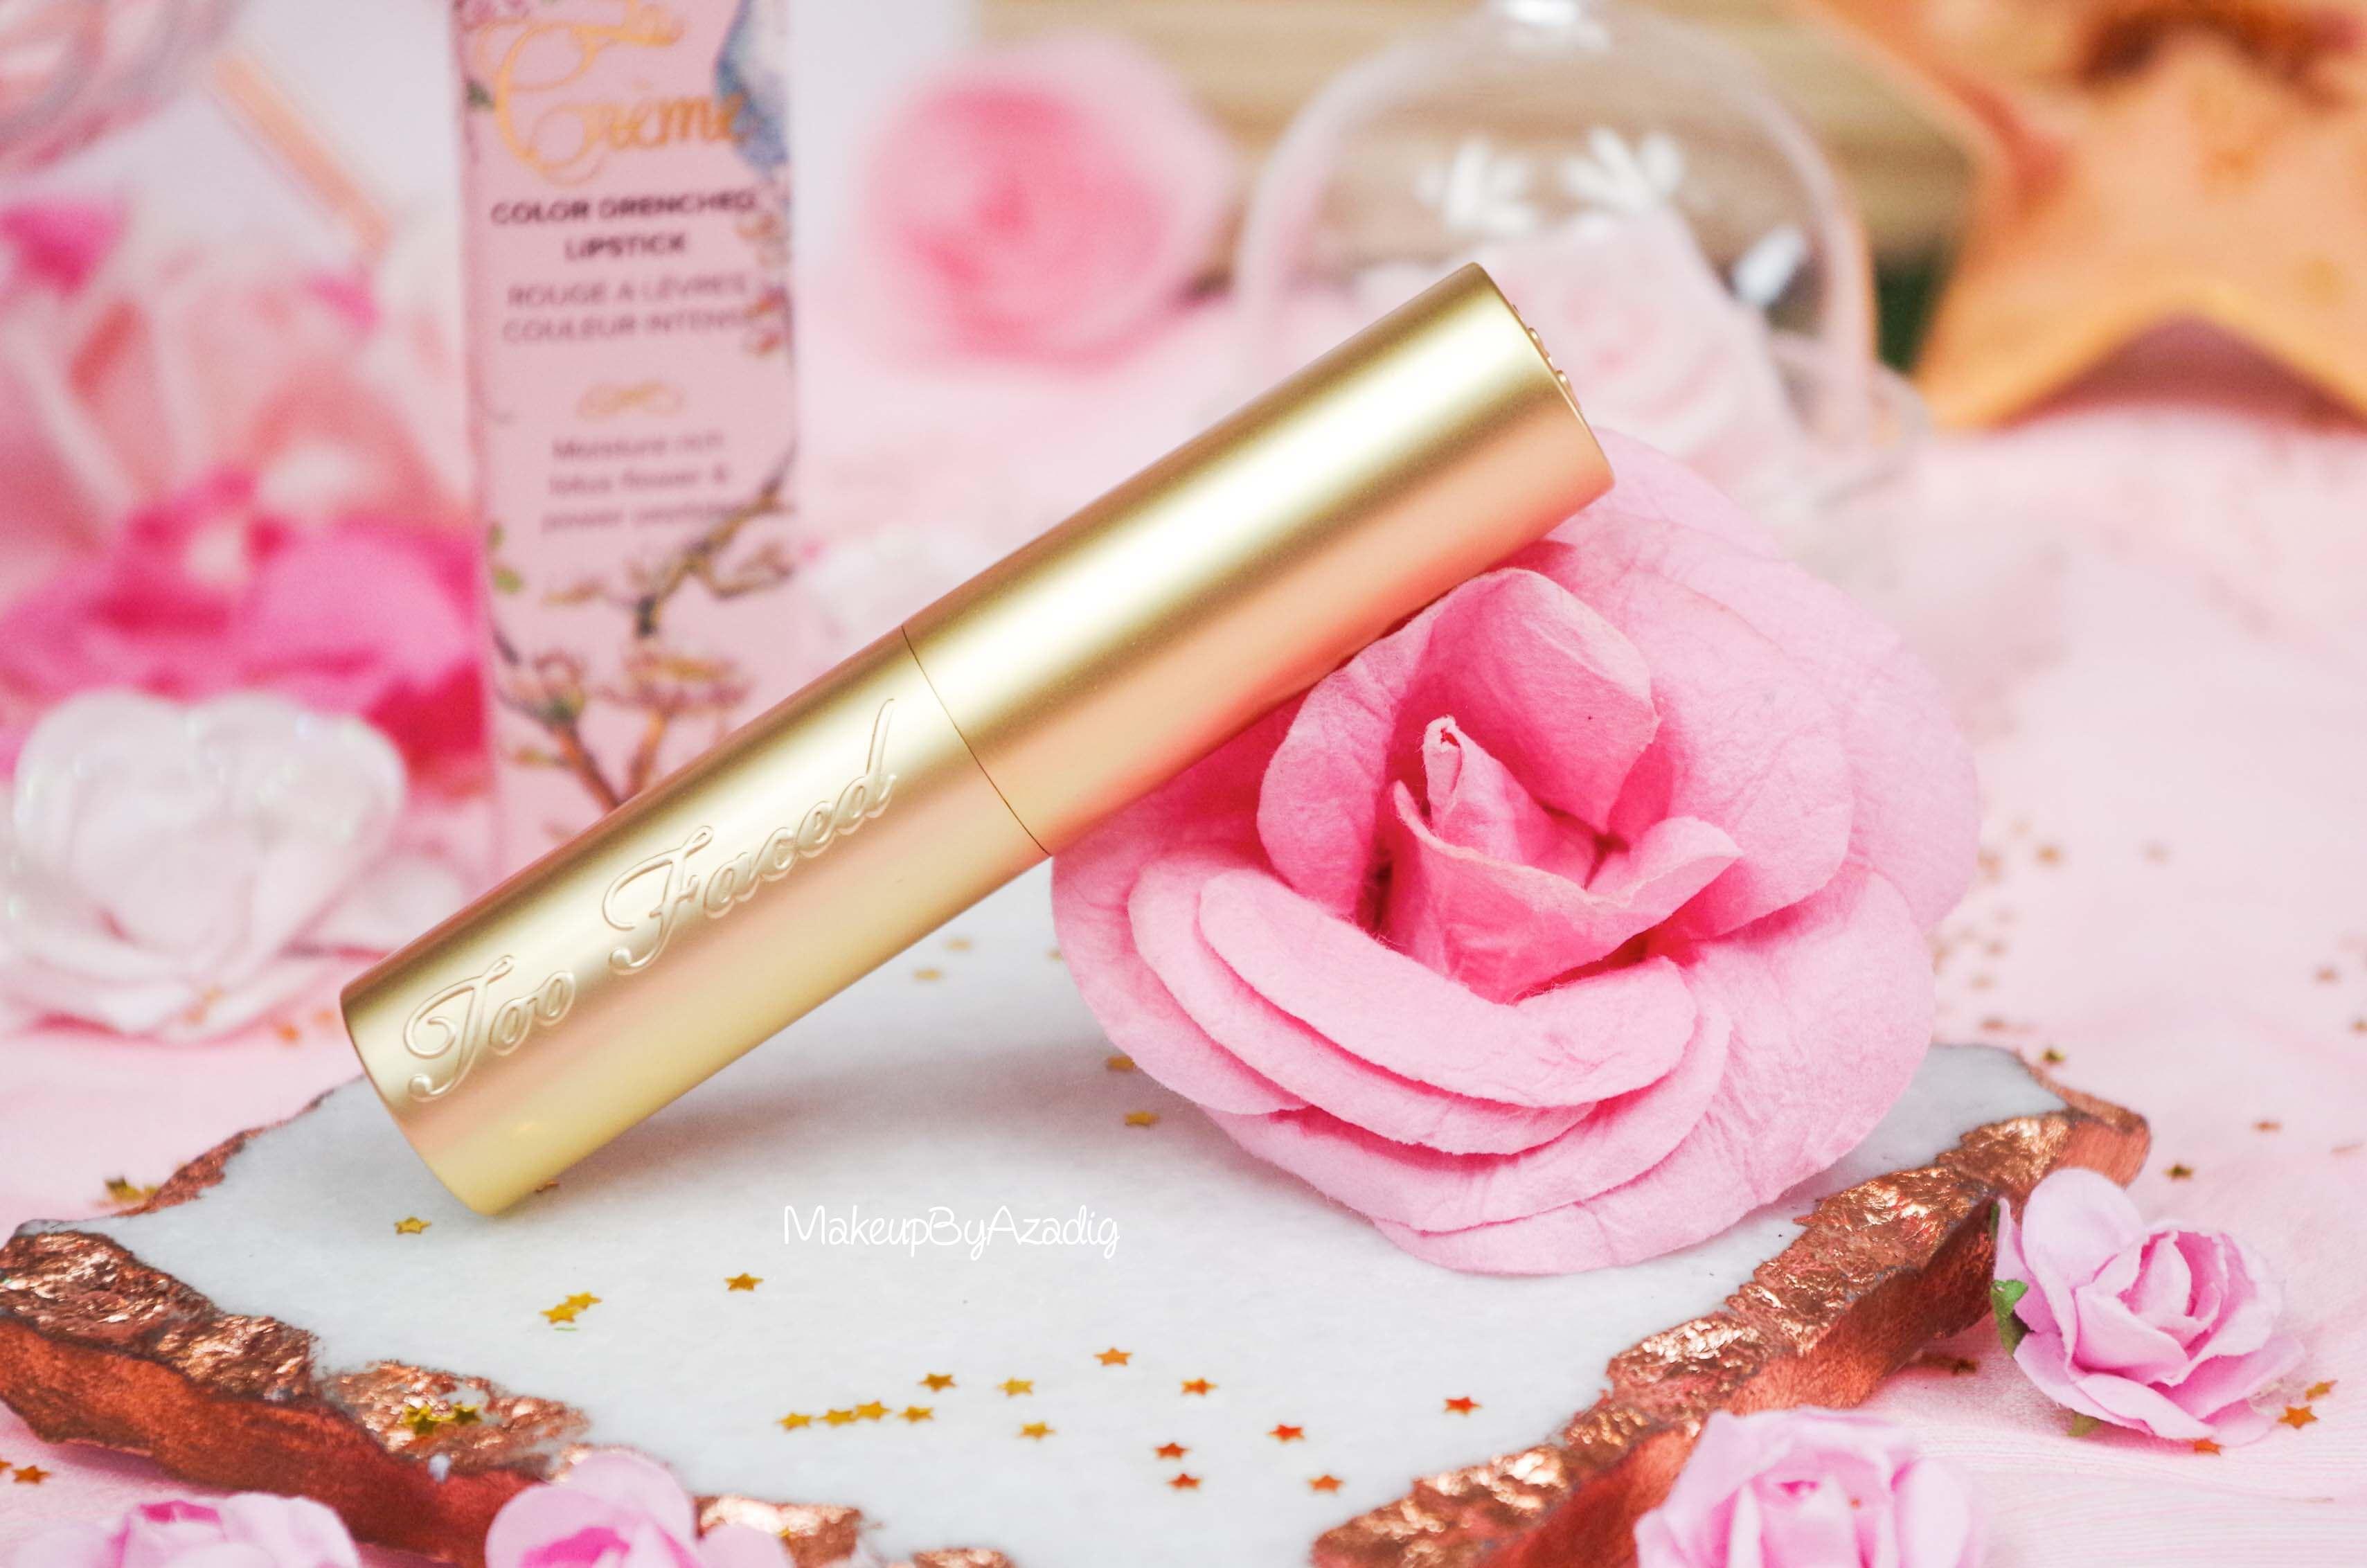 rouge-levres-creme-too-faced-unicorn-tears-magique-makeupbyazadig-swatch-avis-prix-revue-sephora-rose